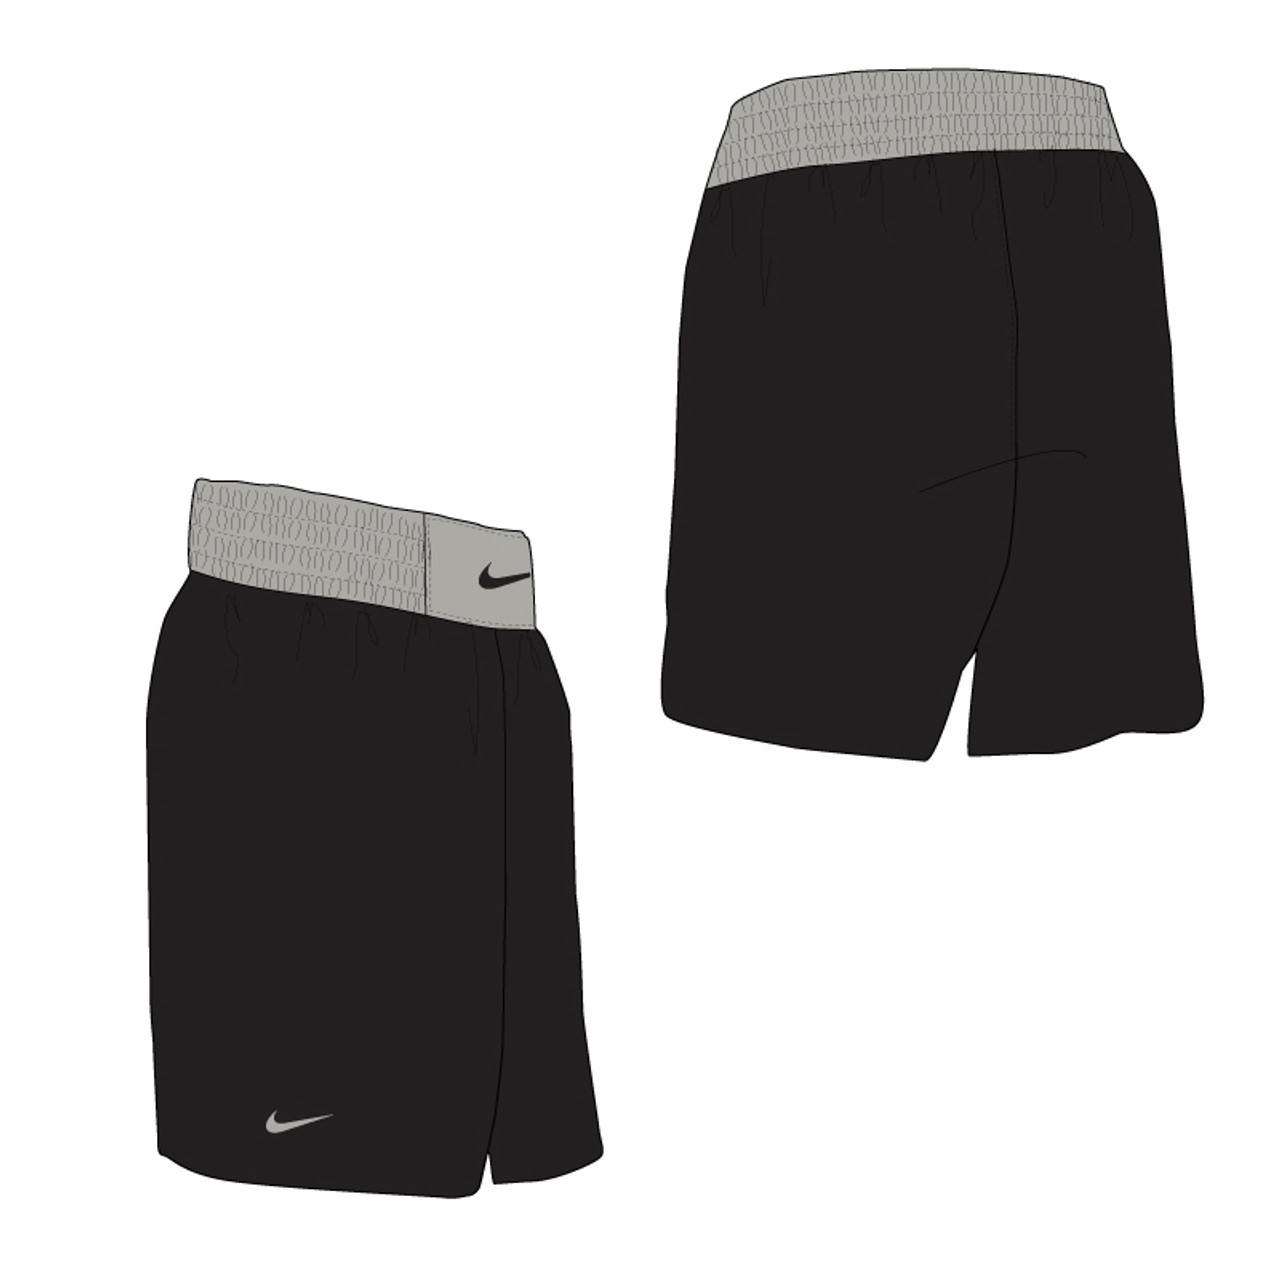 614021efe0 Nike Boxing Short - Black / Pewter - Athlete Performance Solutions EU